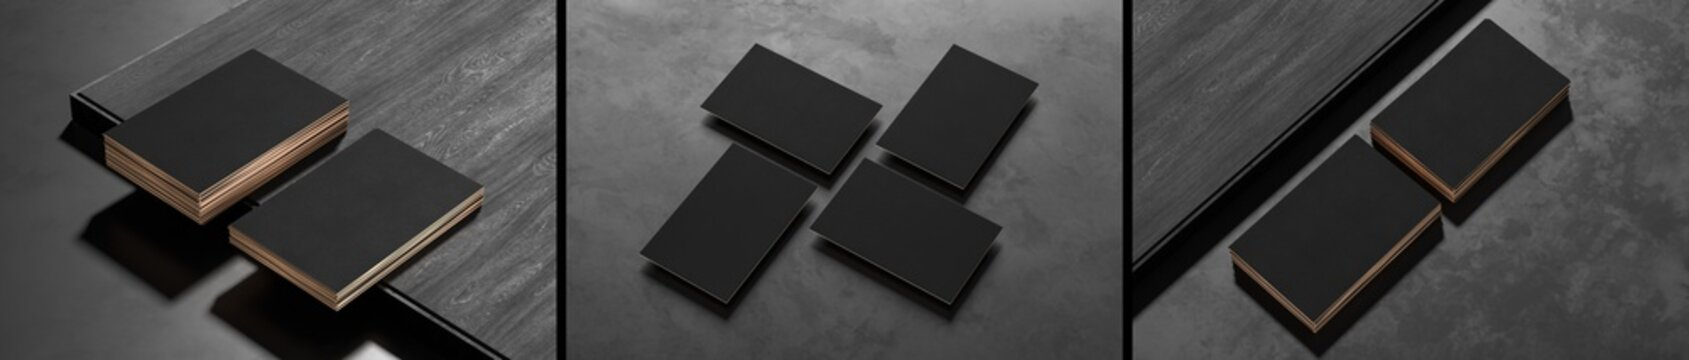 Black business card mock ups isolated on dark background. Three different business card mock ups on dark background. 3D illustration.